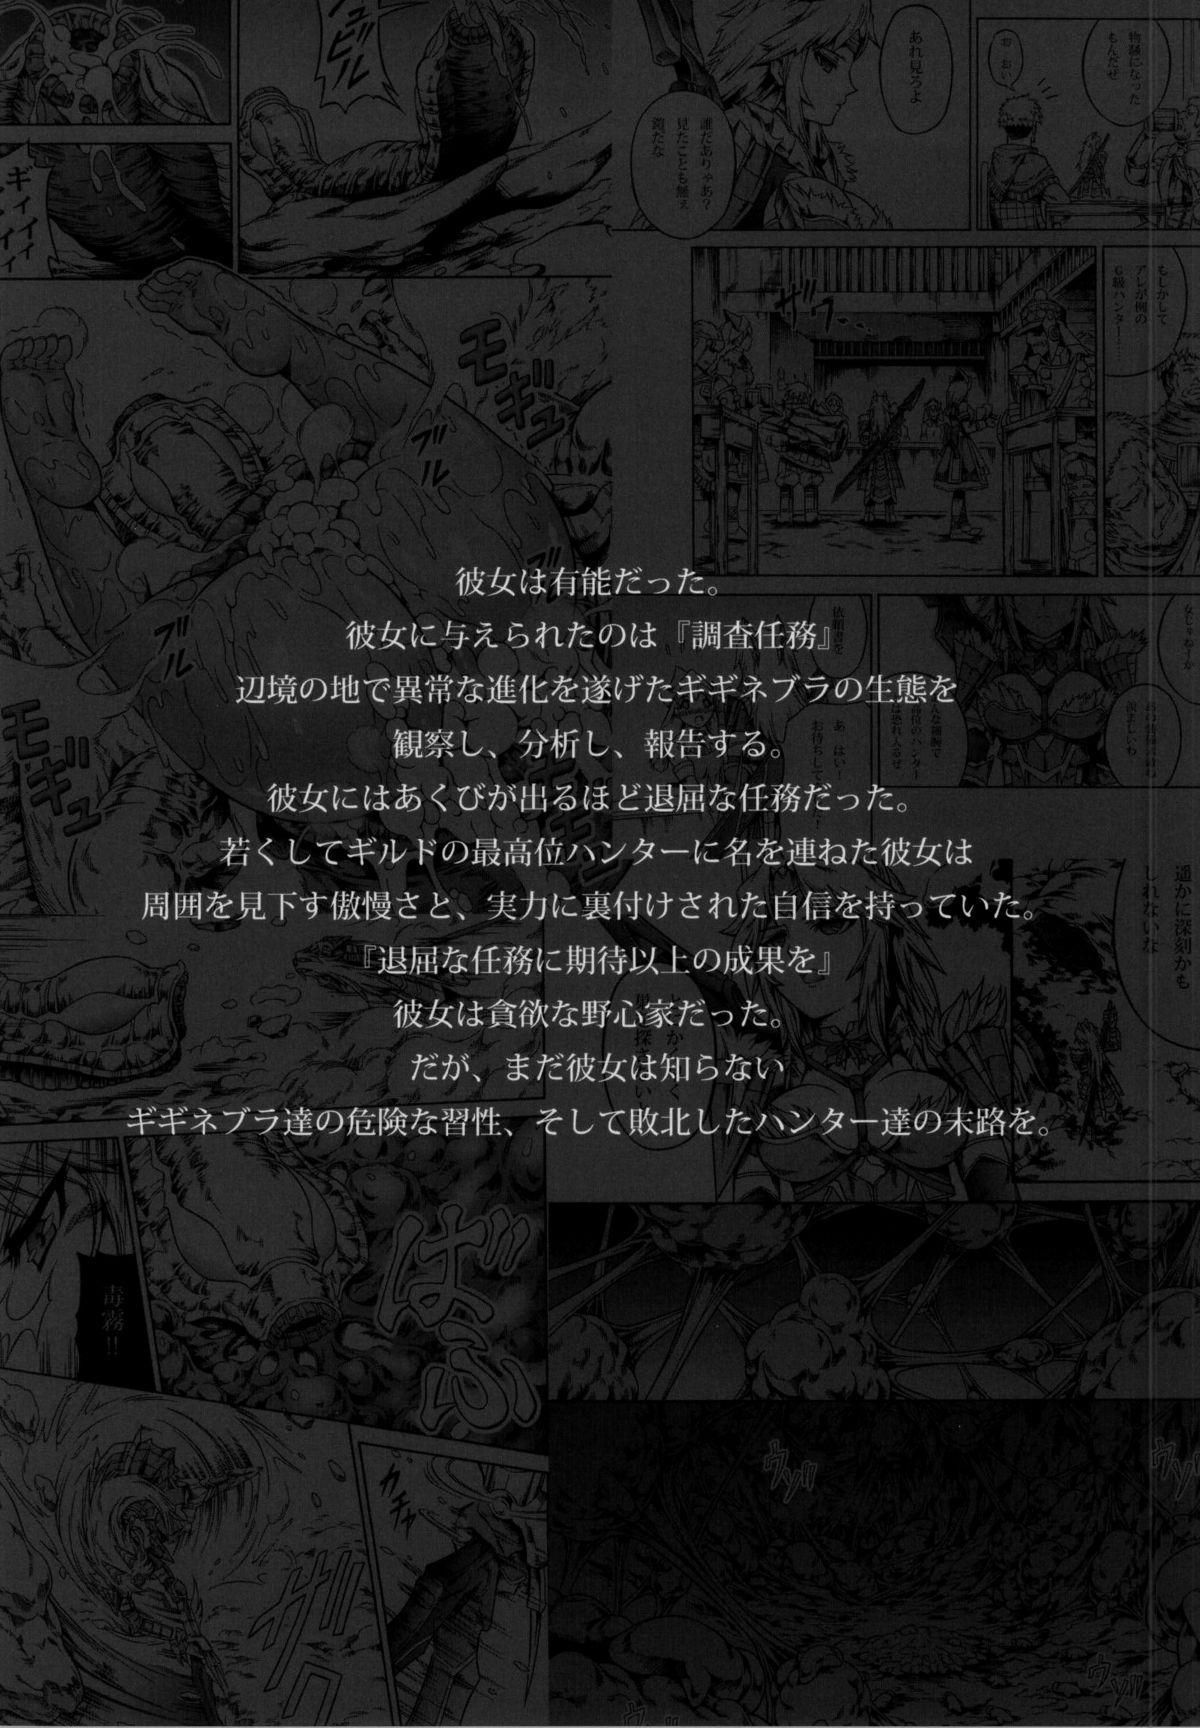 Solo Hunter no Seitai 4 The third part 3